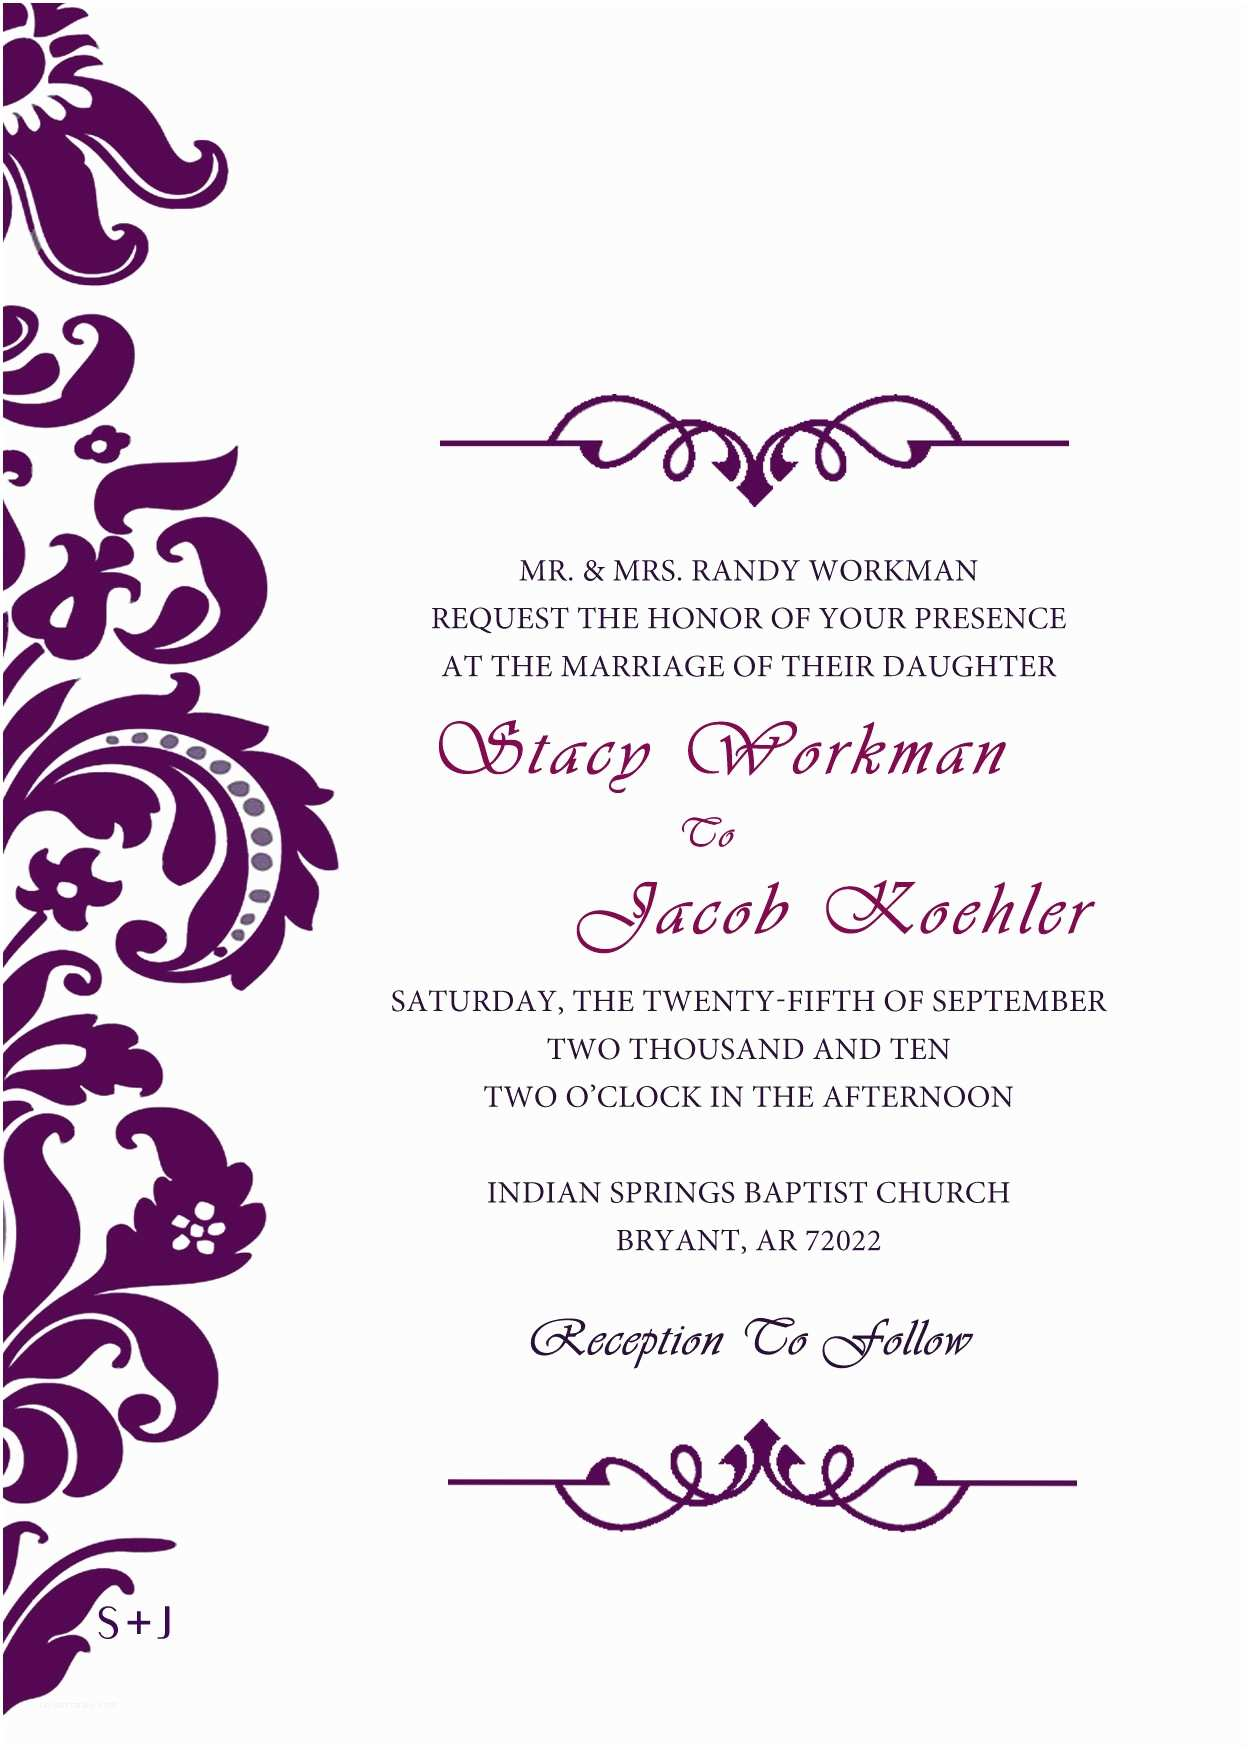 Make Your Own Wedding Invitations Ideas Wedding Invitations Design